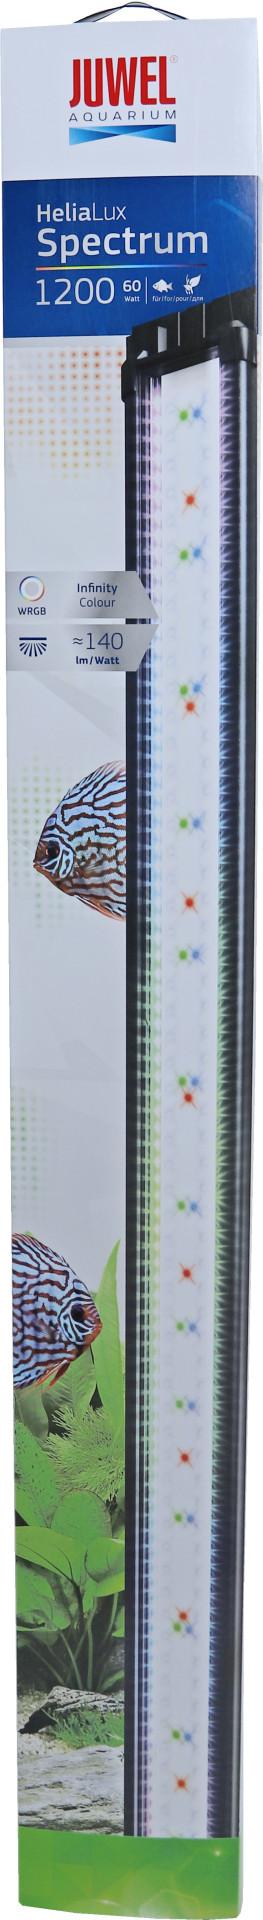 Juwel ledverlichting HeliaLux Spectrum LED 1200 60 watt